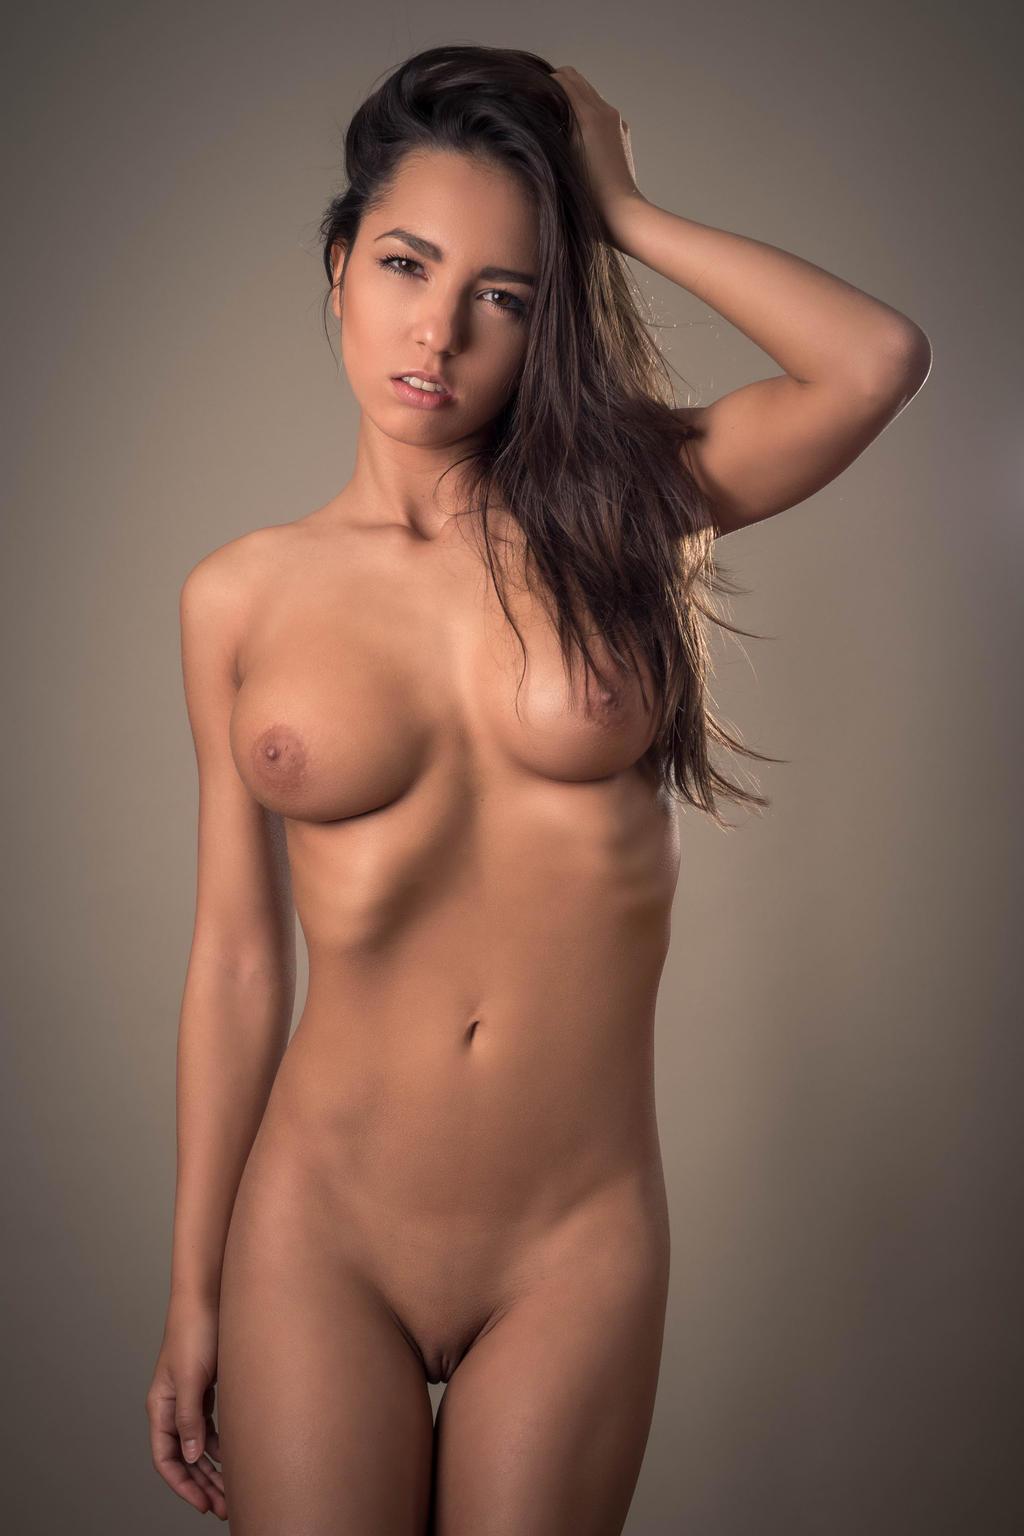 artistic-female-nudes